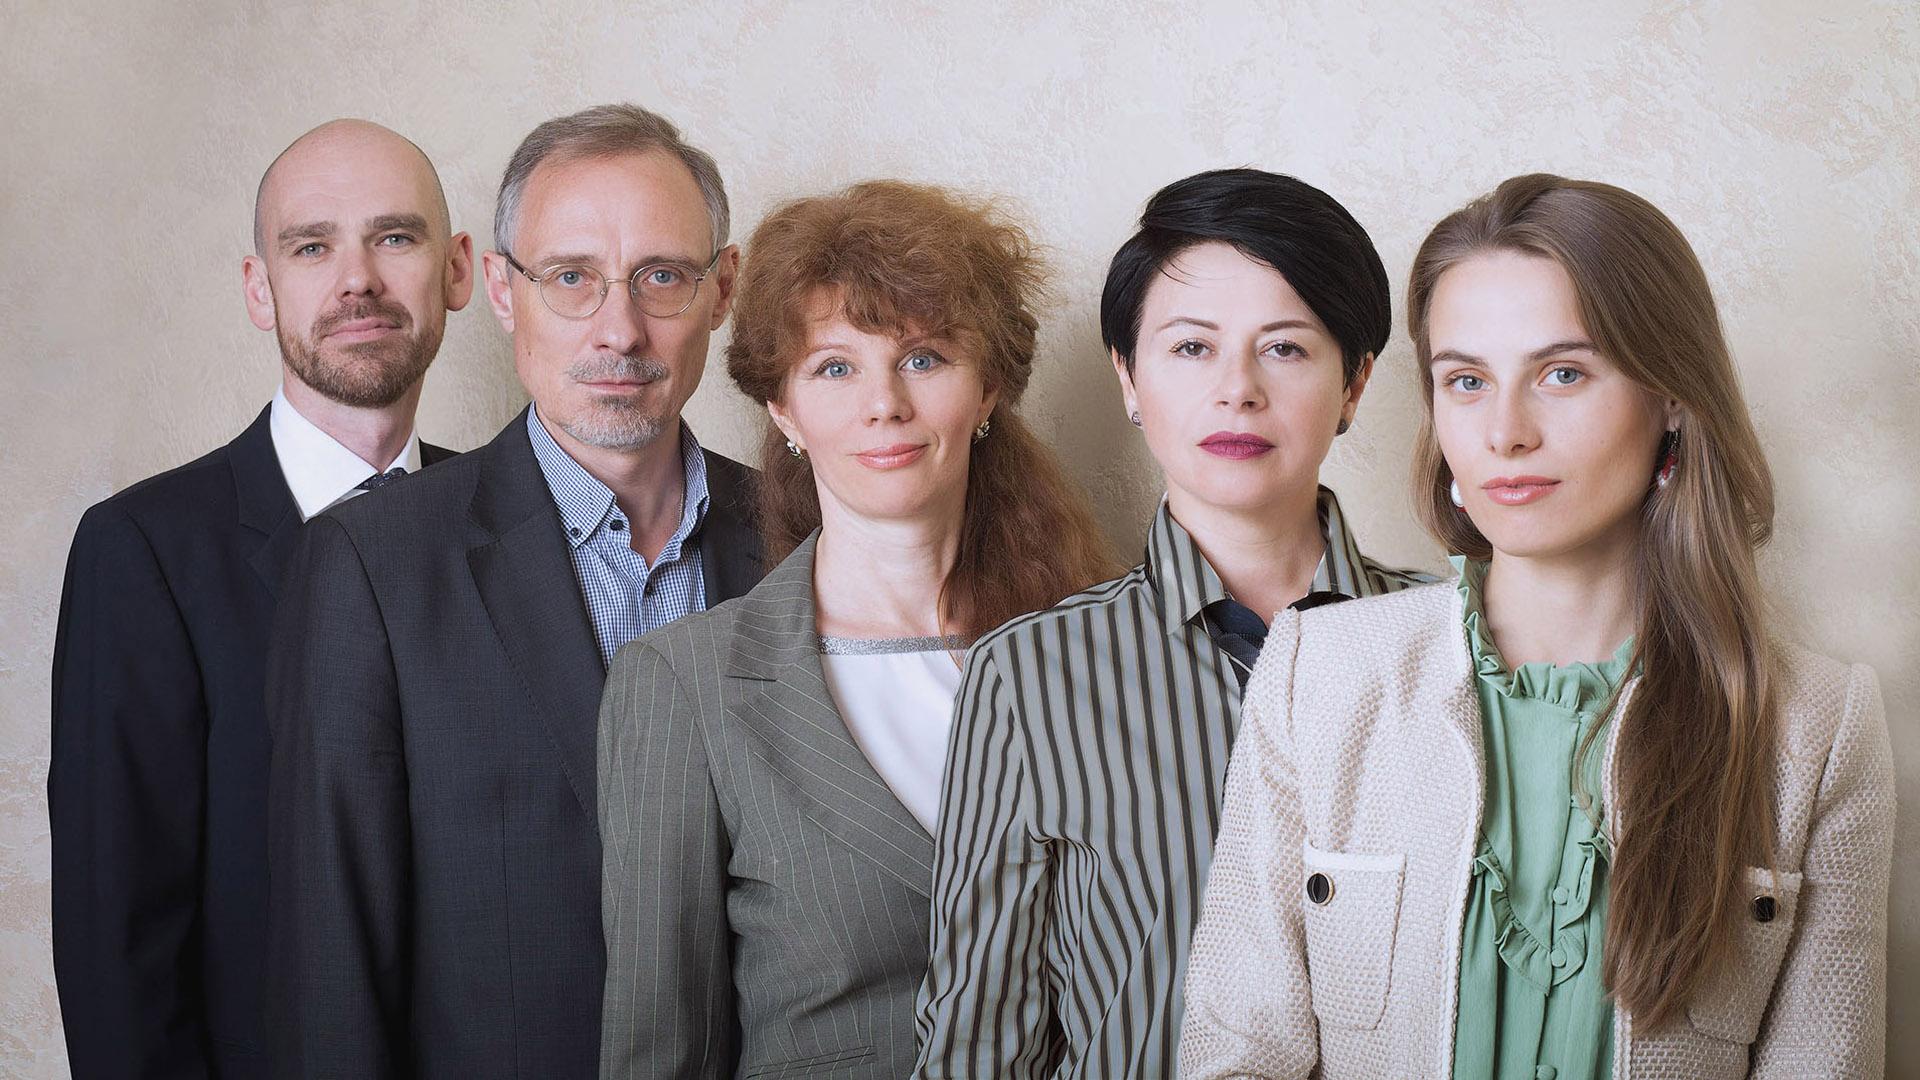 Юристы Юрвнешсервис Команда фото